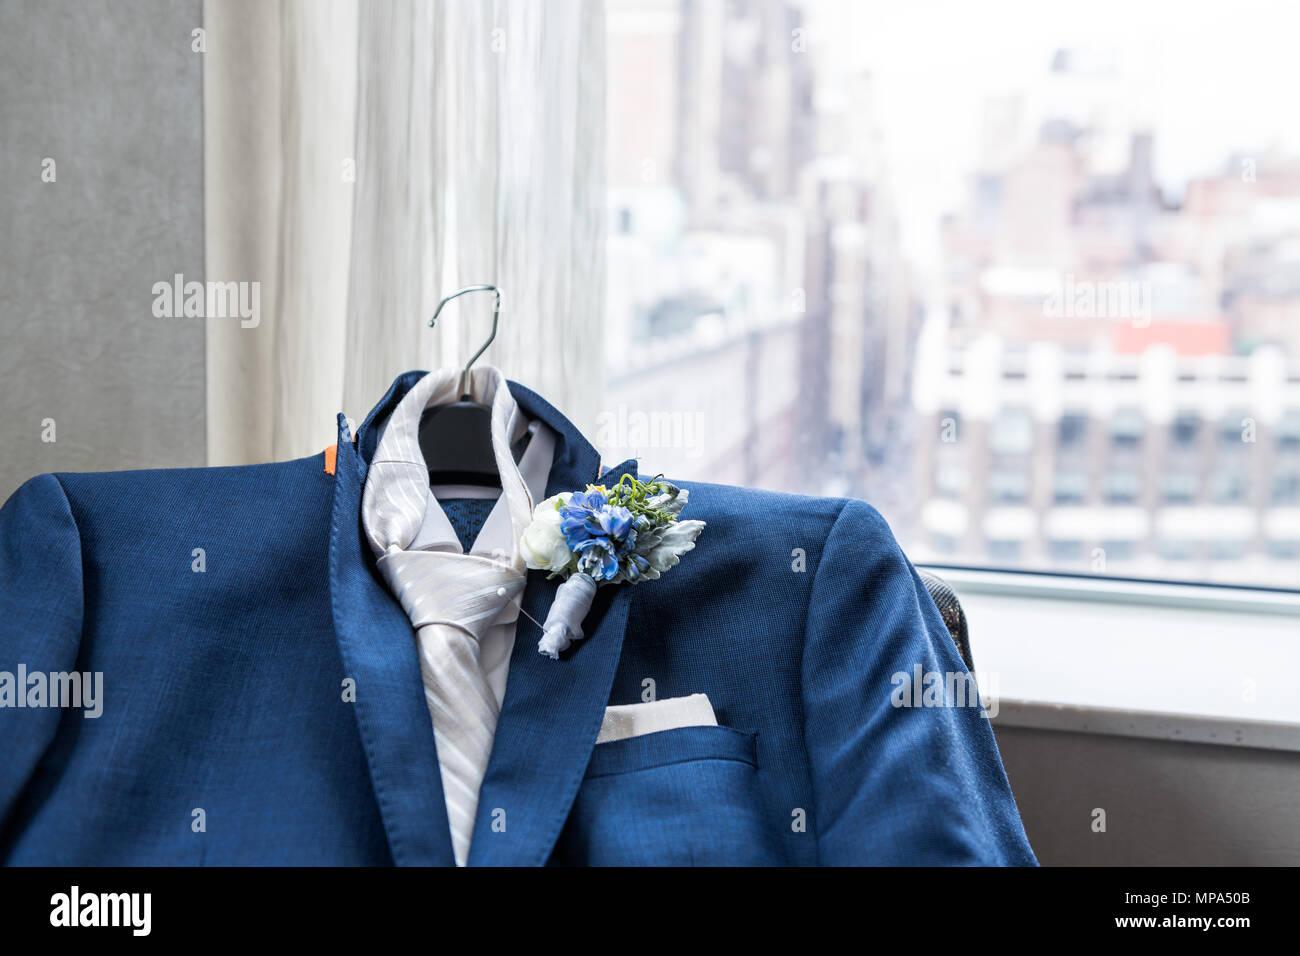 231bc17d96bdb Men's suit and tie groom closeup with flower boutonniere, pin wedding  preparation, pocket handkerchief